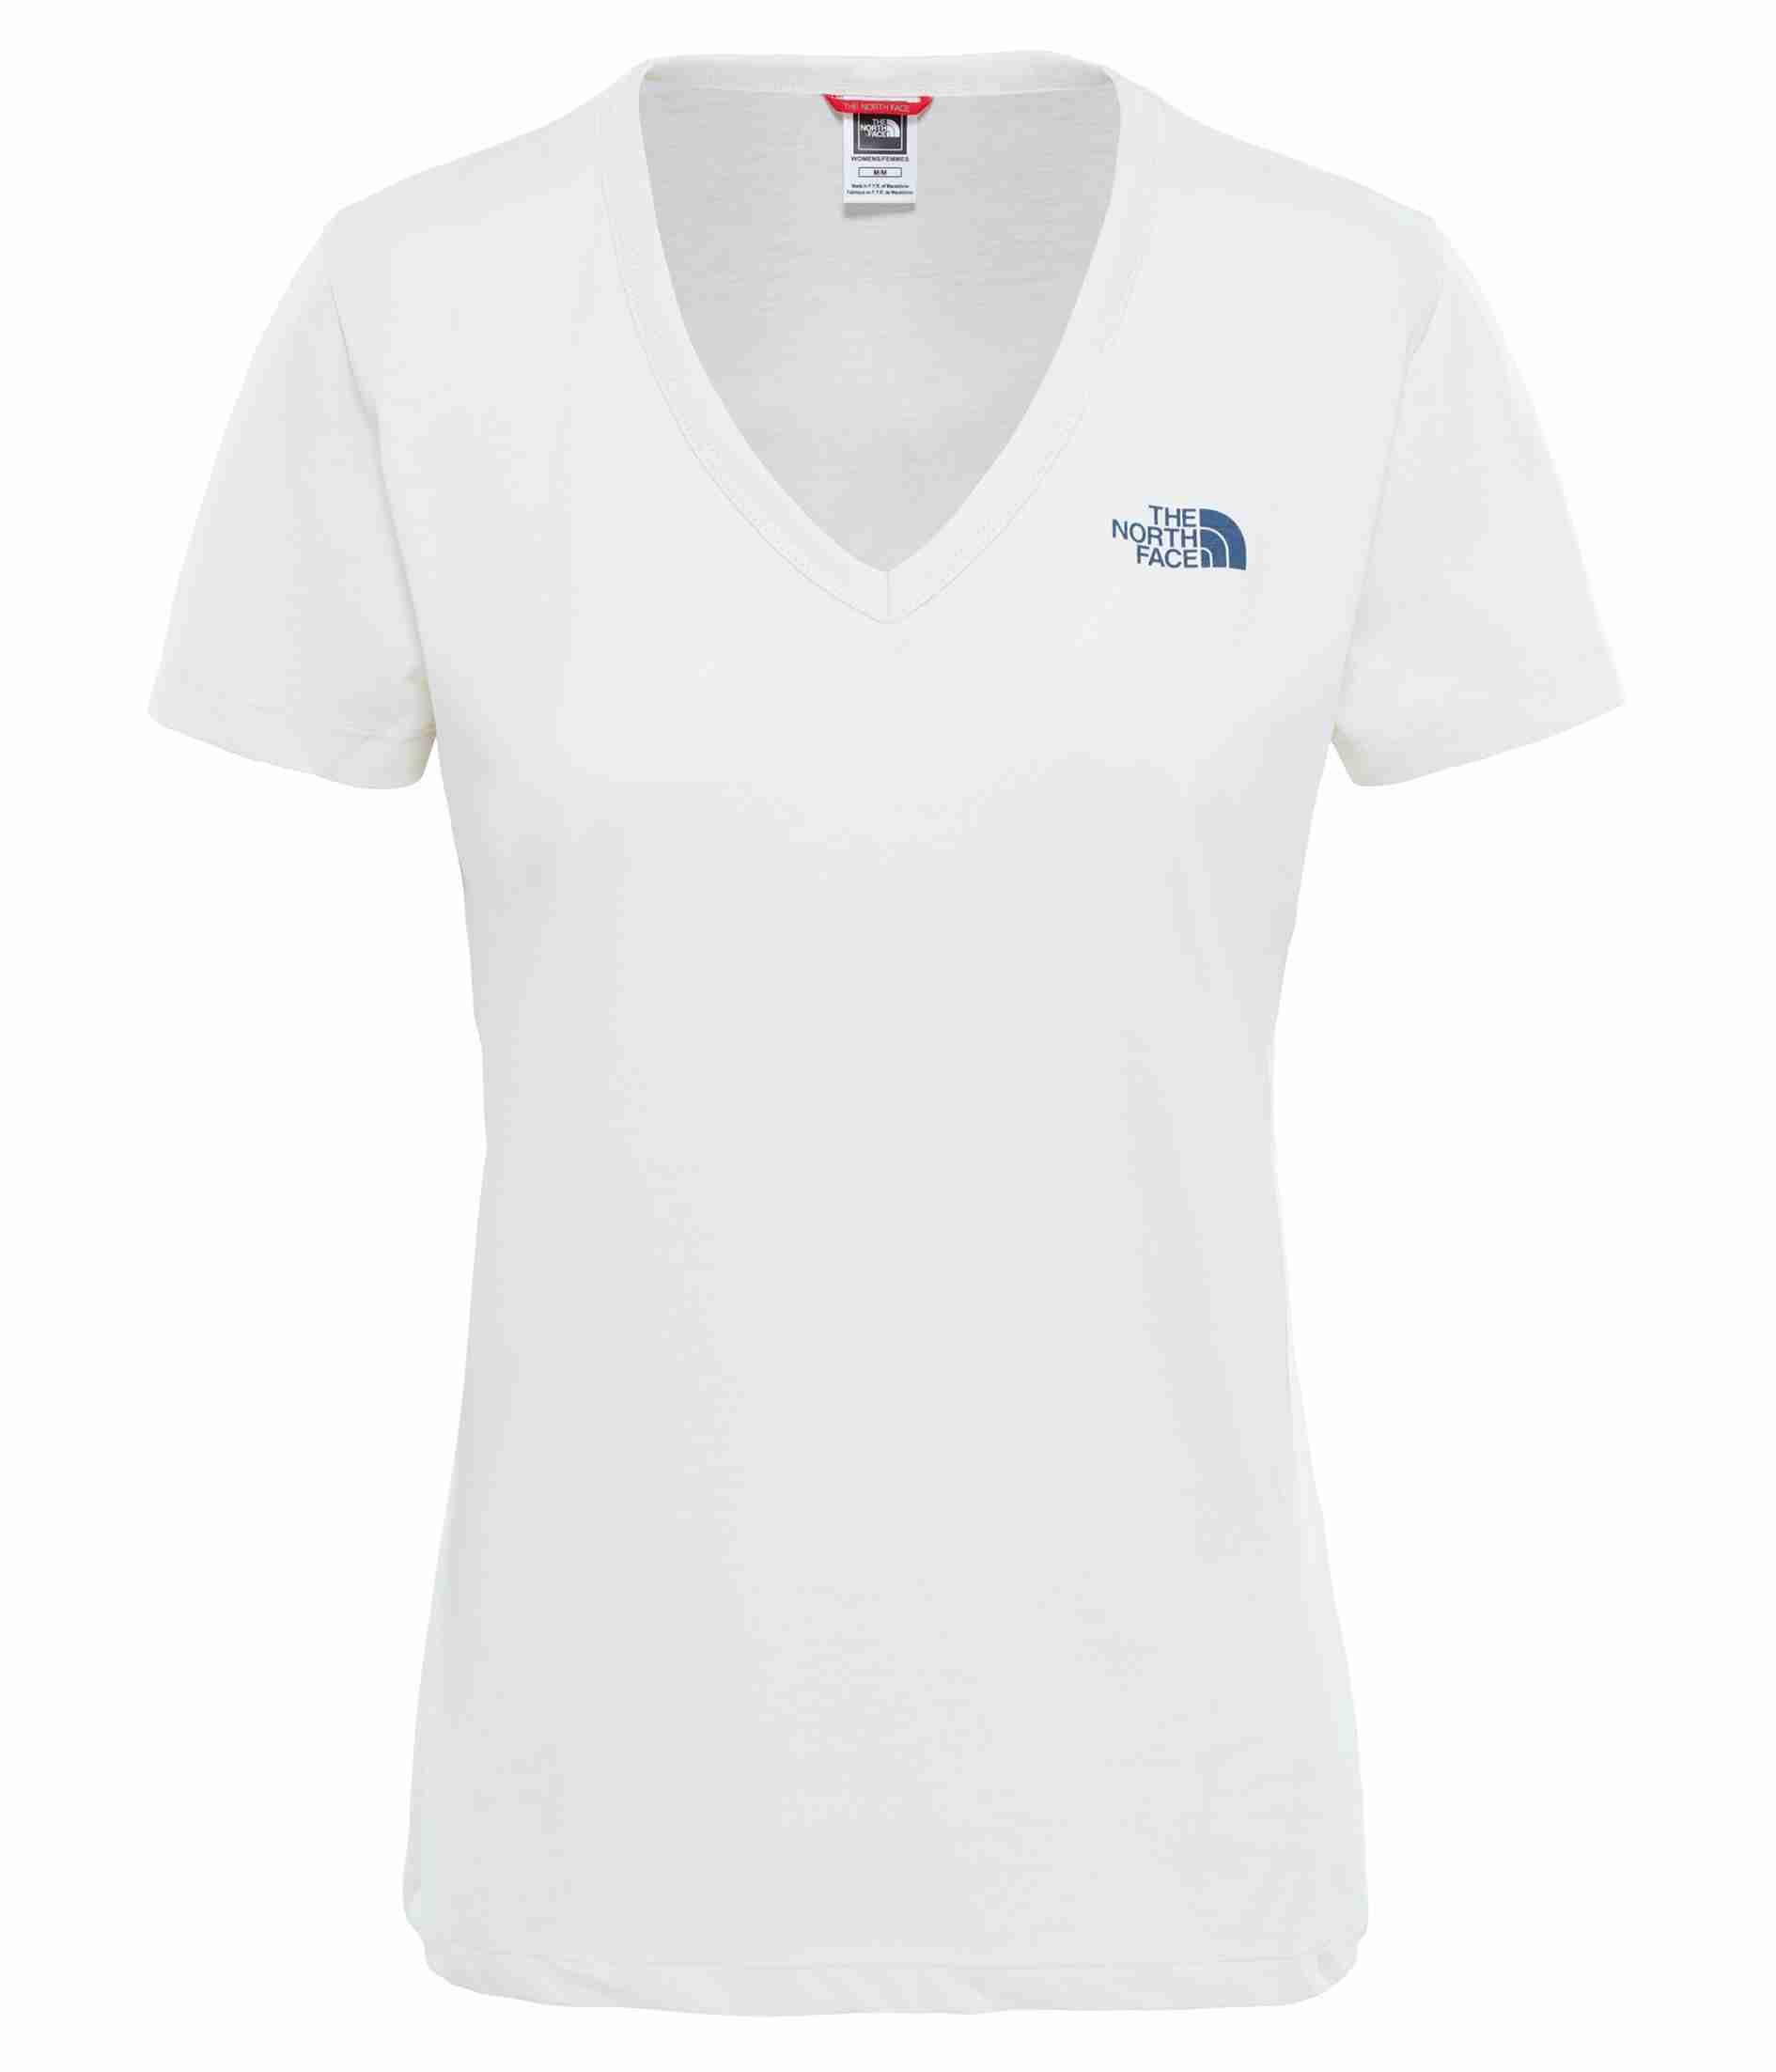 Witte Sportshirt Dames | RLDM